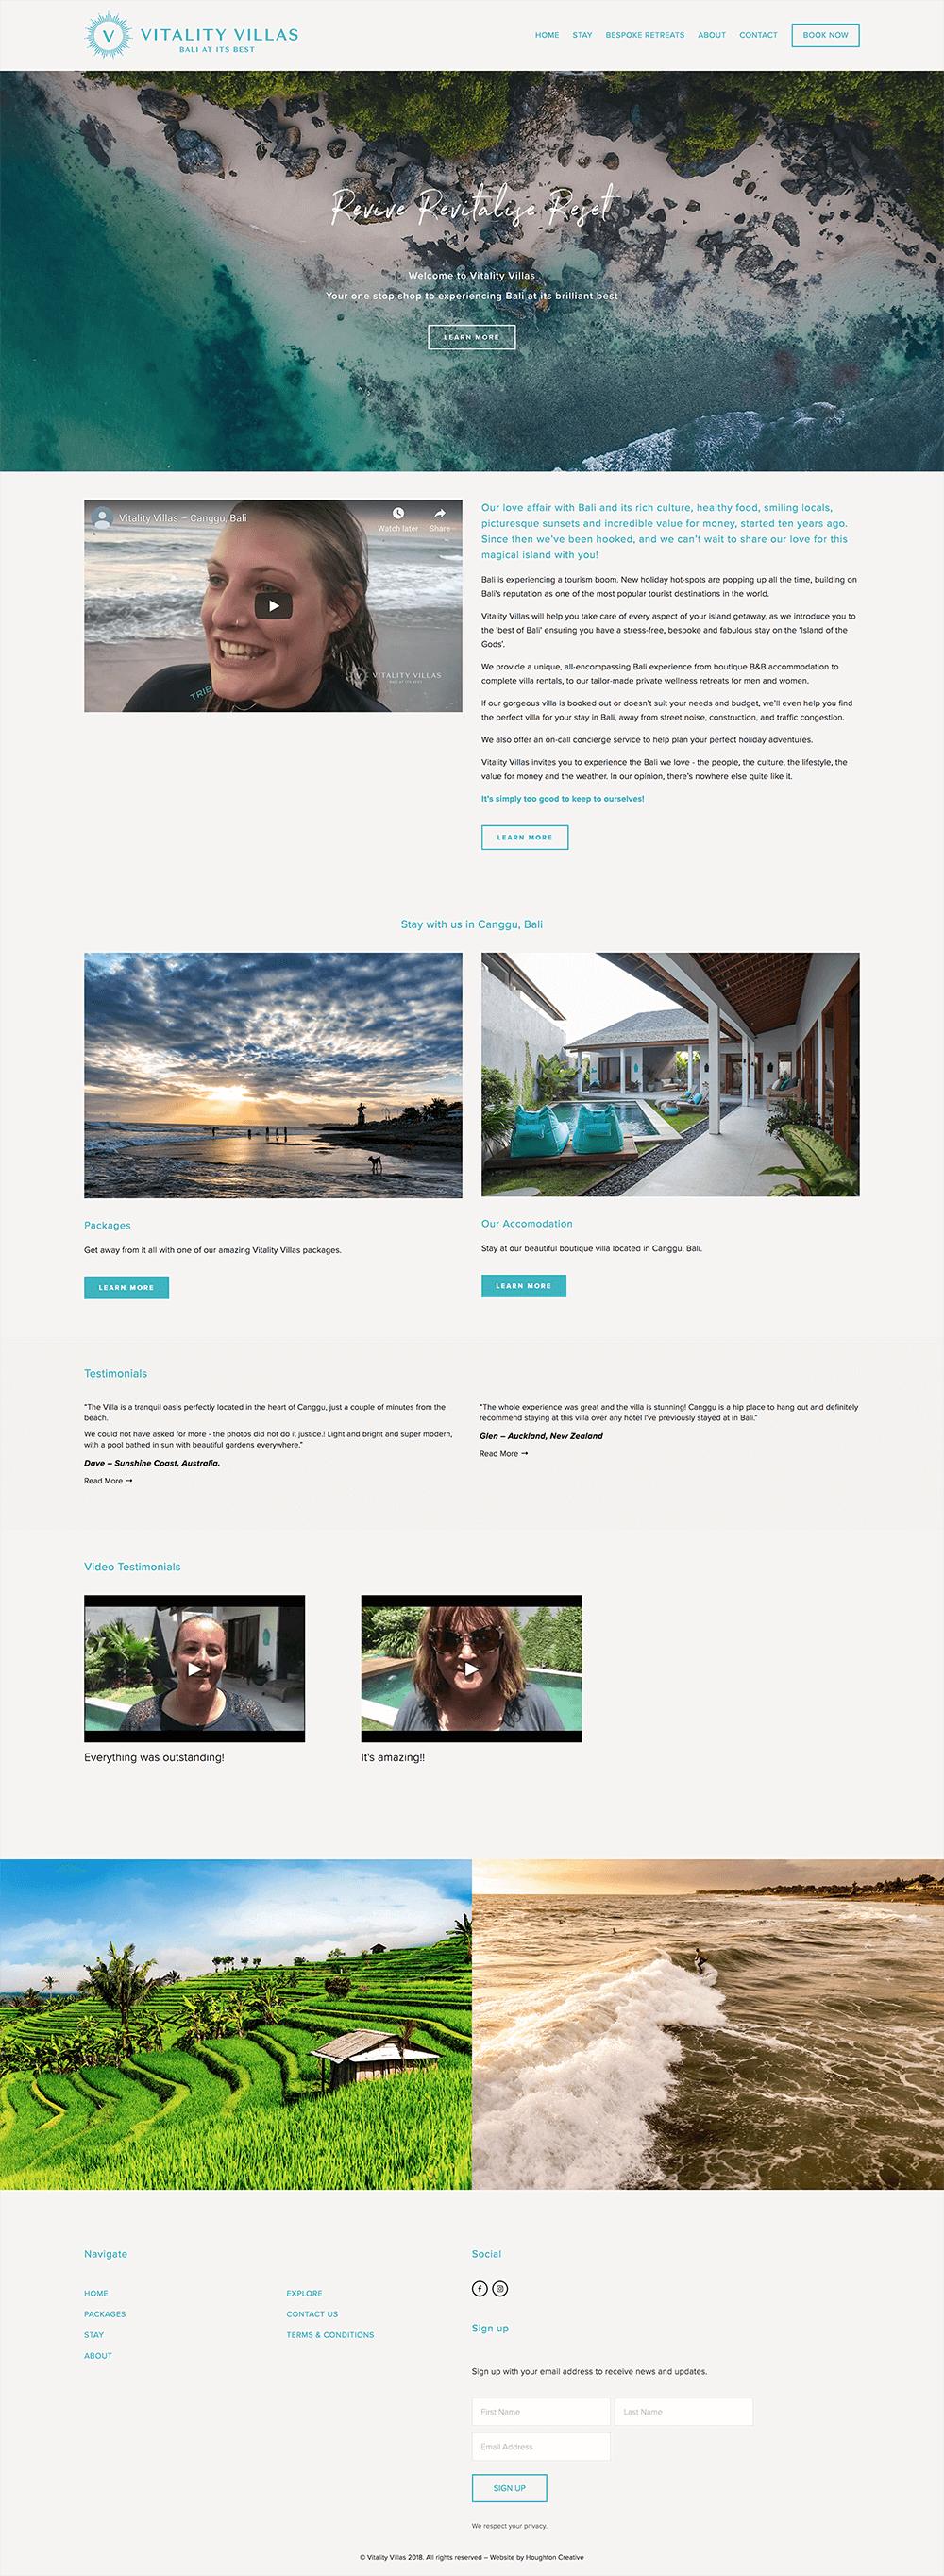 Vitality Villas - Website Home page